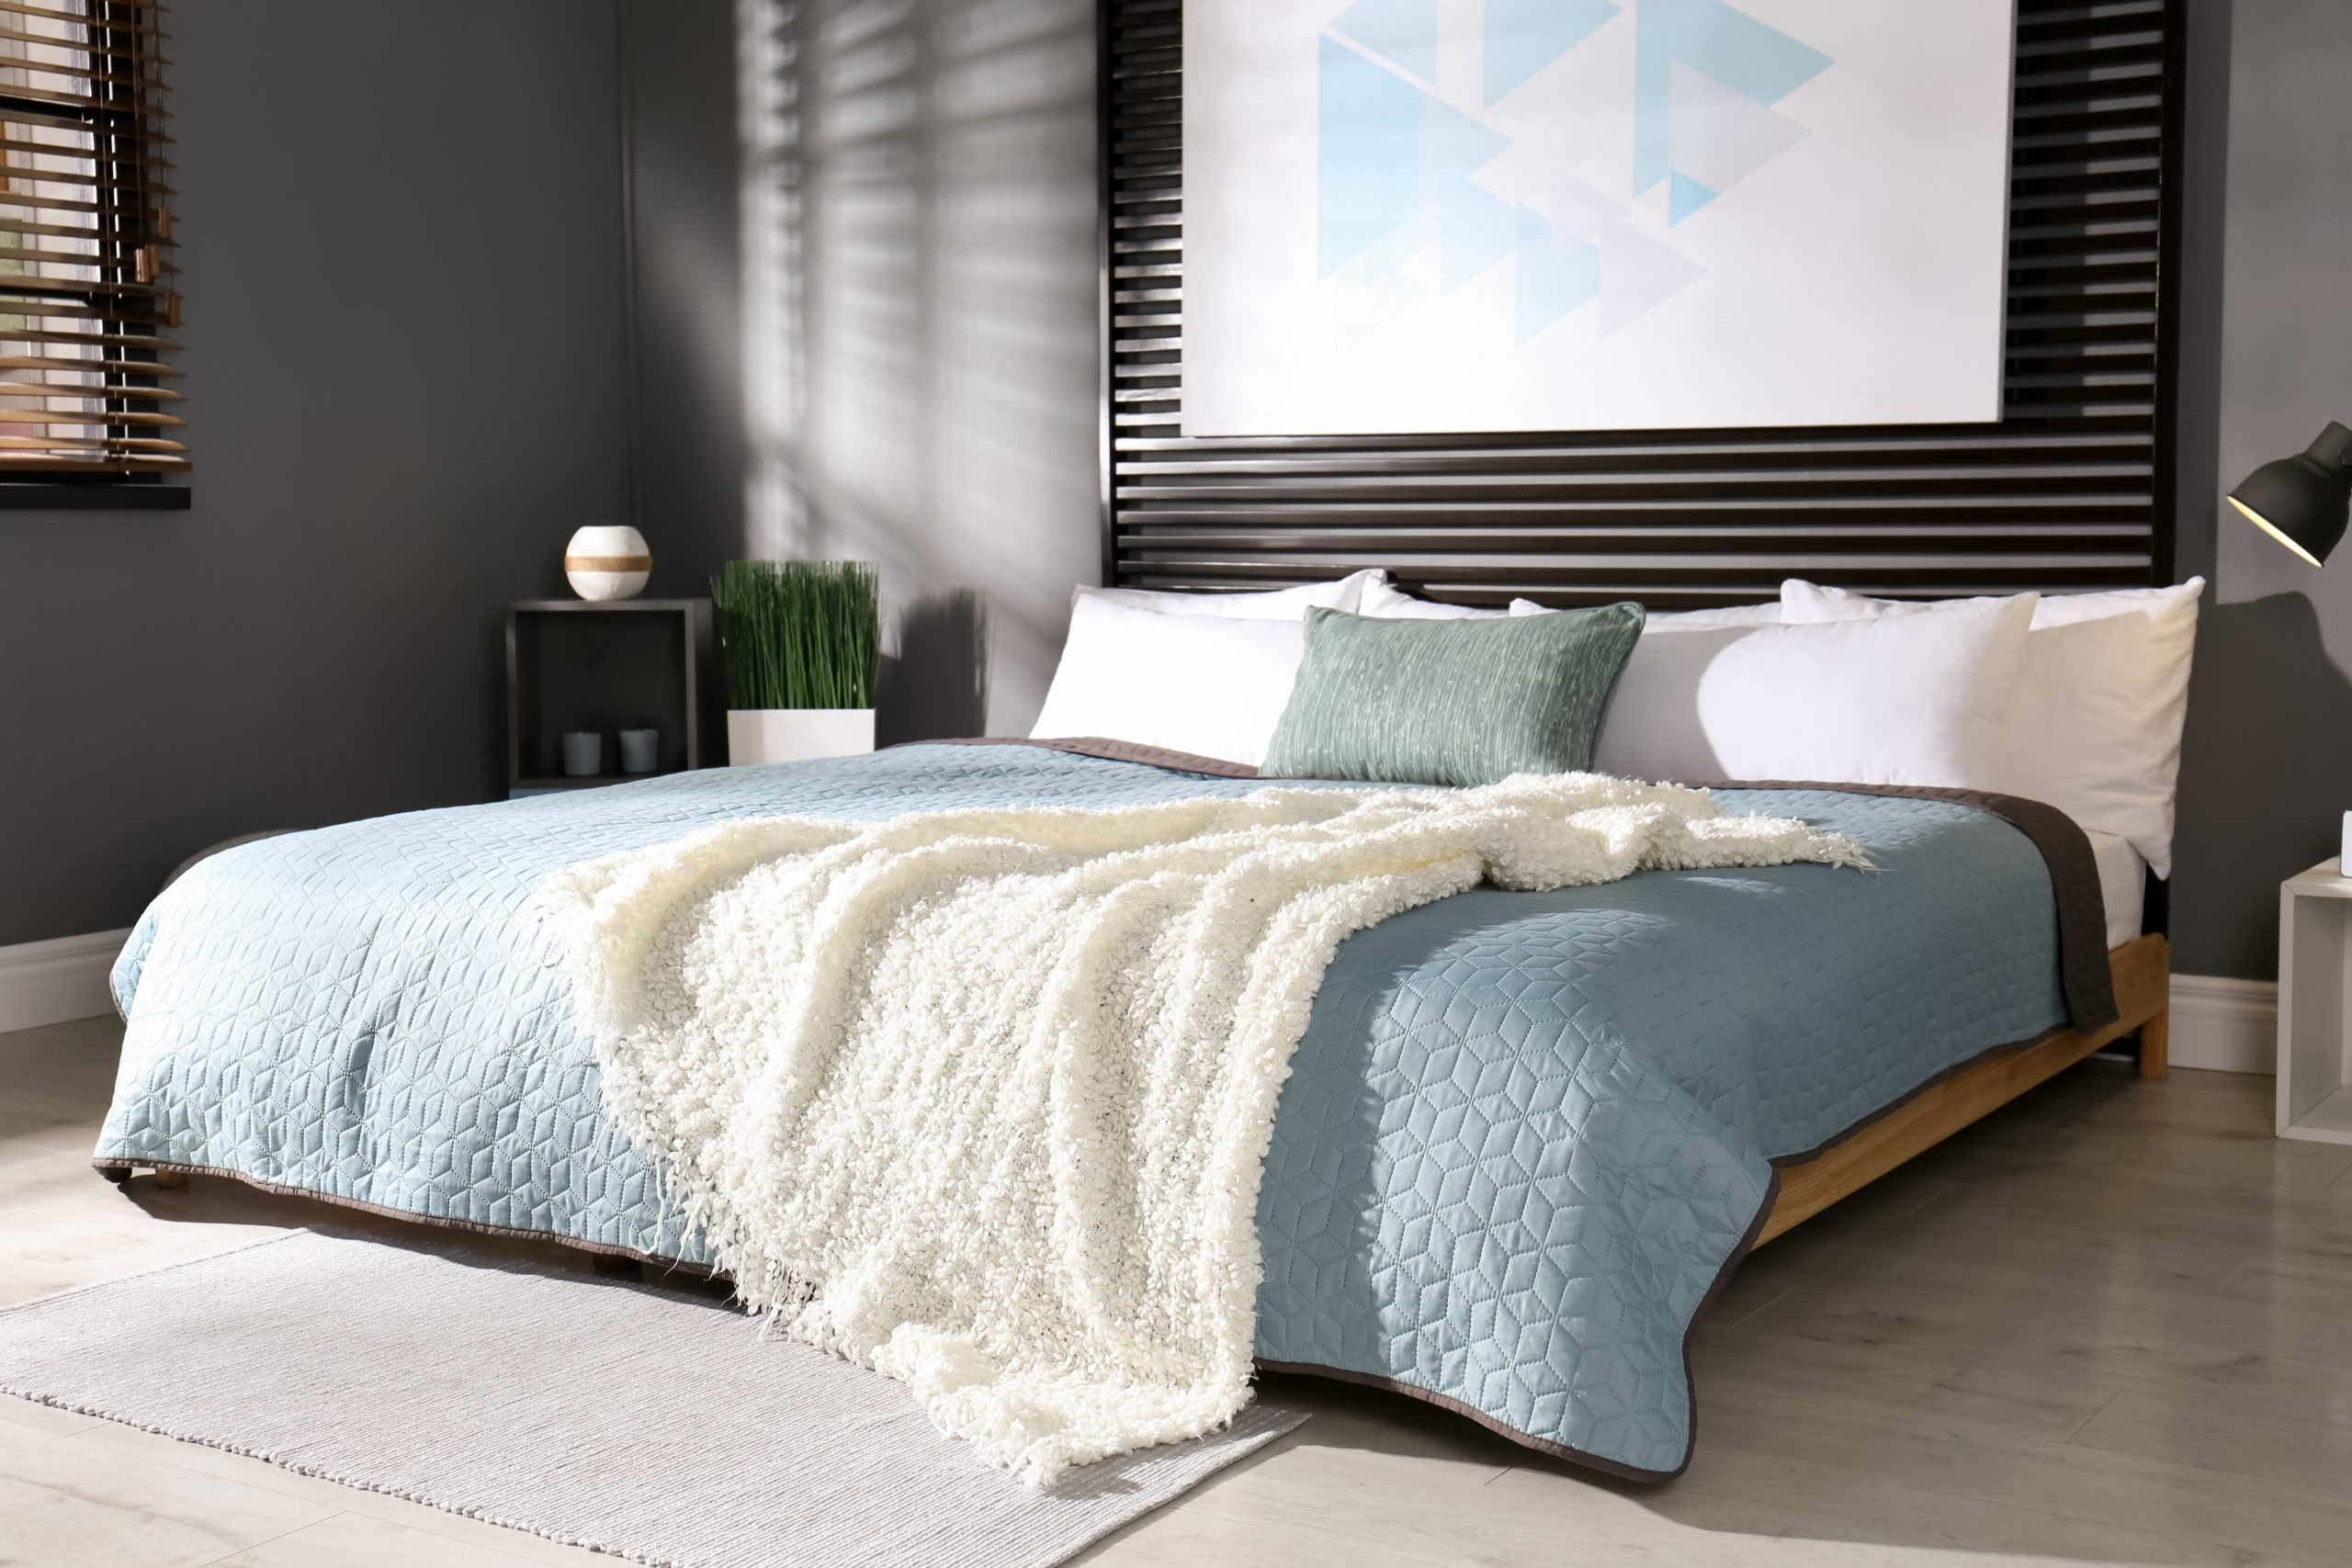 moderna pohodlna postel v spalni s tienenim drevenymi zaluziami